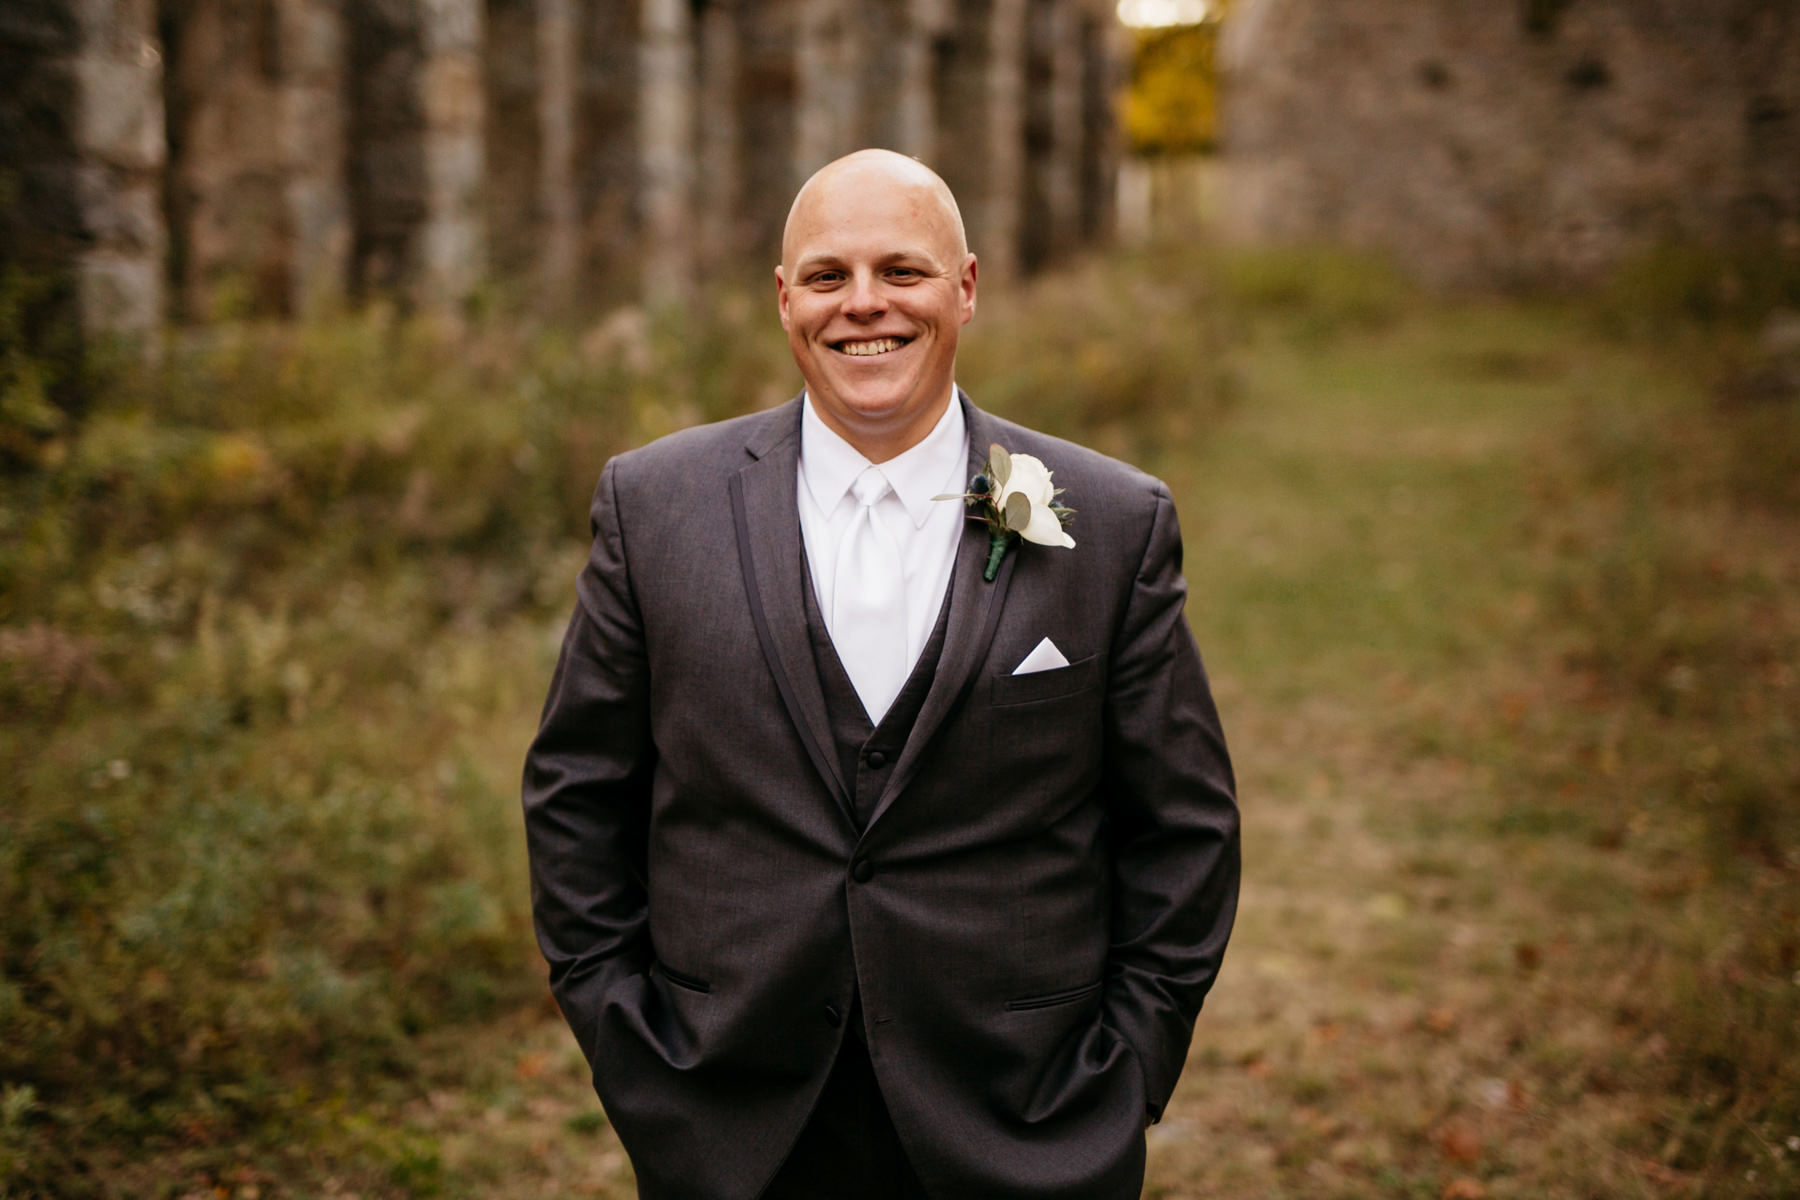 Quincy Ma Massachusetts Wedding Dedham Boston Granie Links Wedding New England Catholic Cathedral Liz Osban Photography 76.jpg